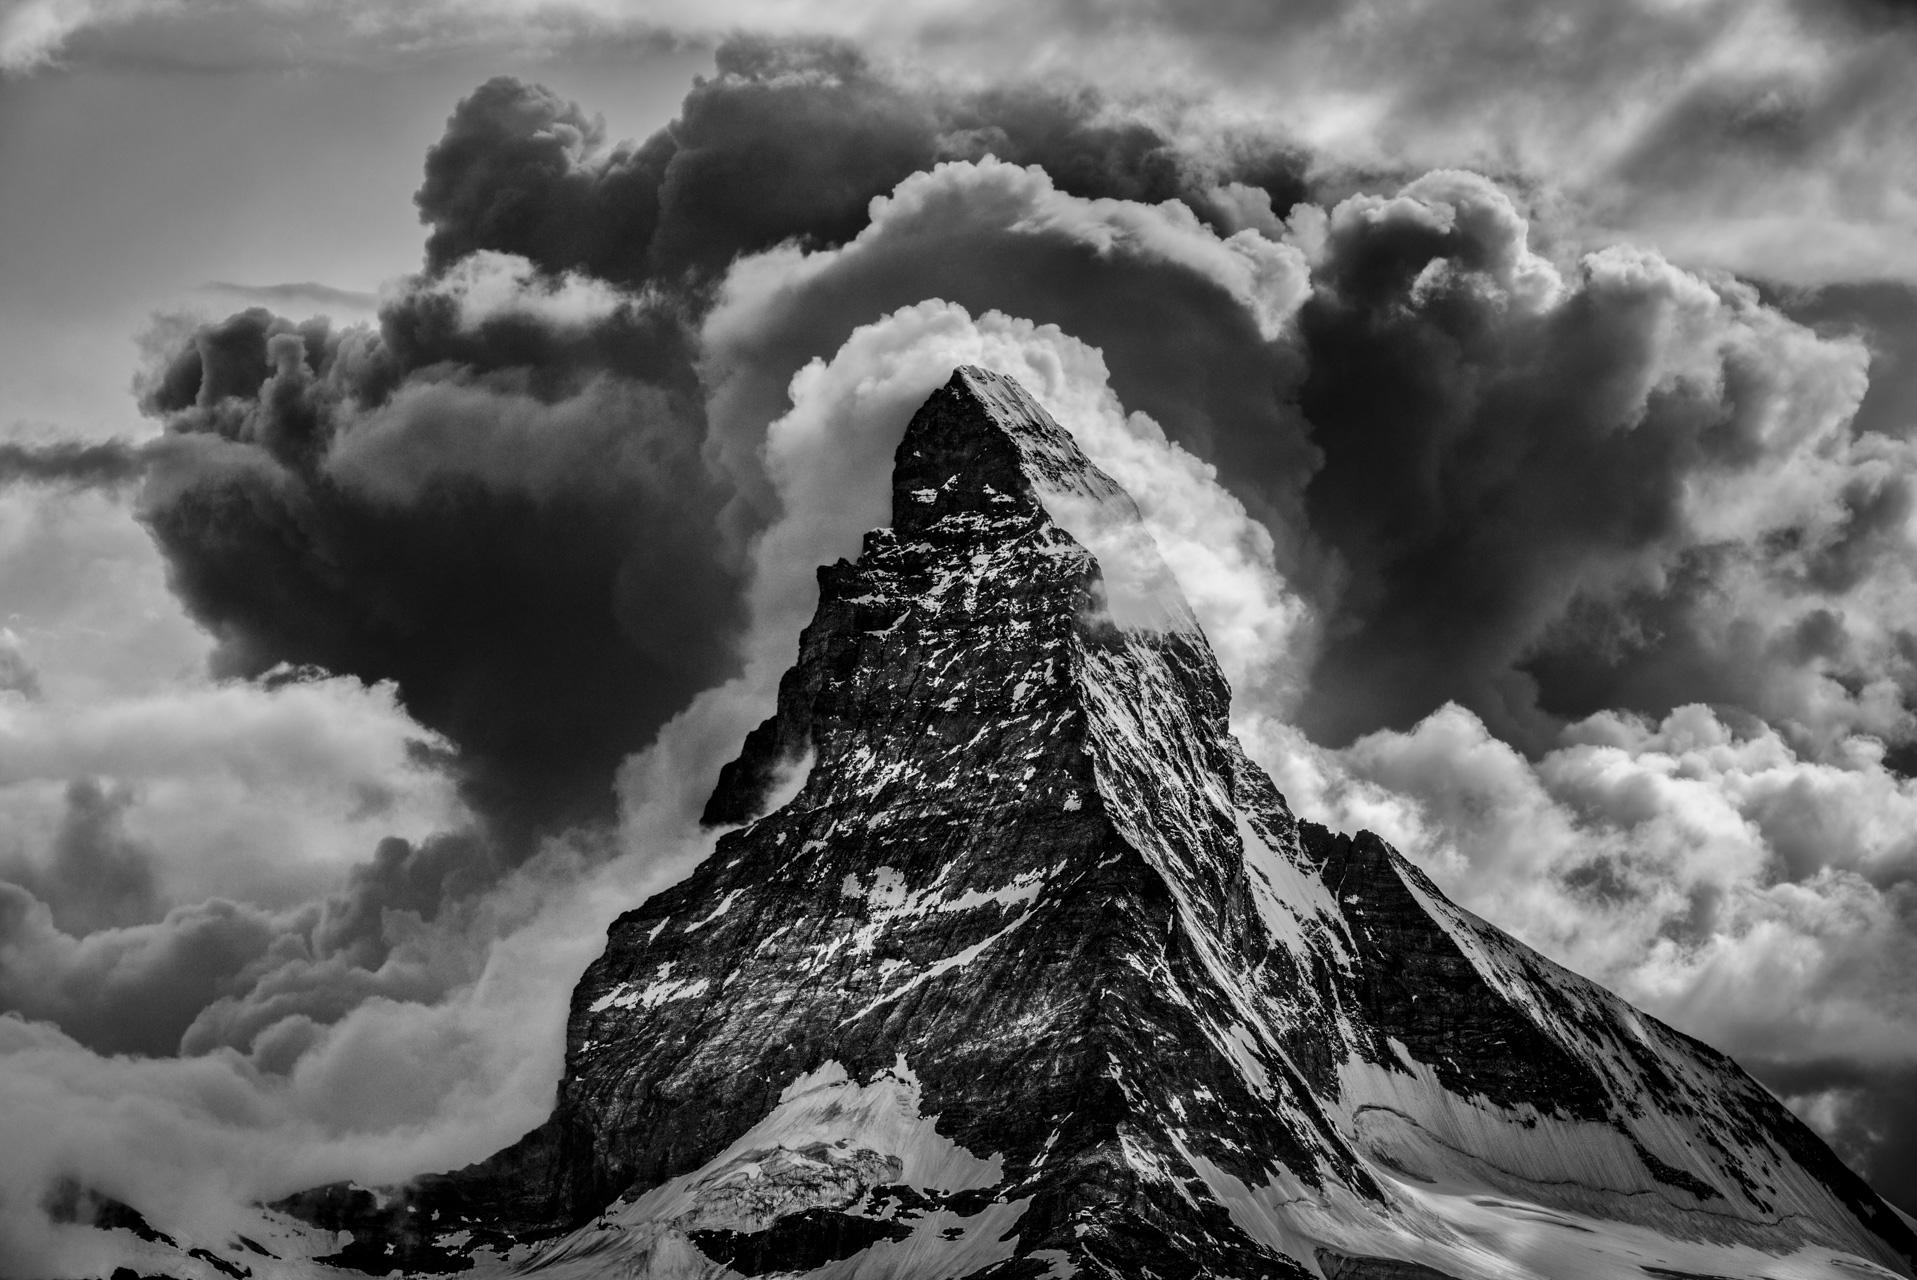 Montagne photo - Zermatt - Matterhorn